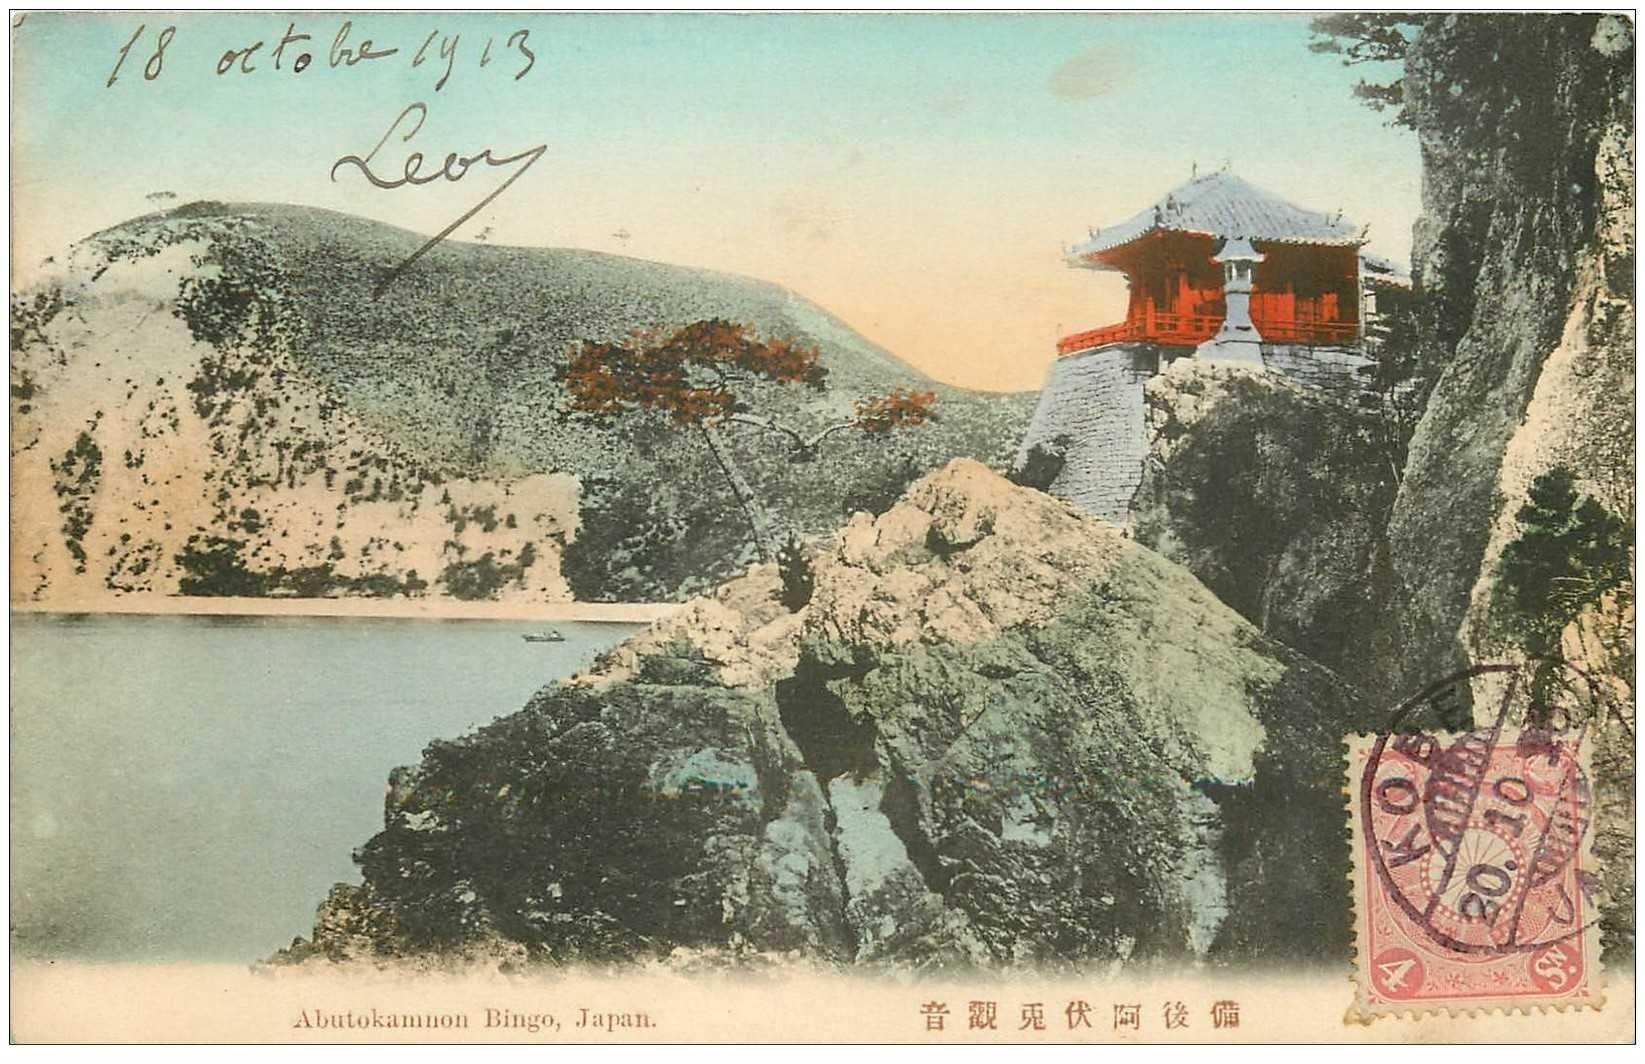 carte postale ancienne JAPON. Abutokamnon Bingo KOBE 1913 sea of Japan